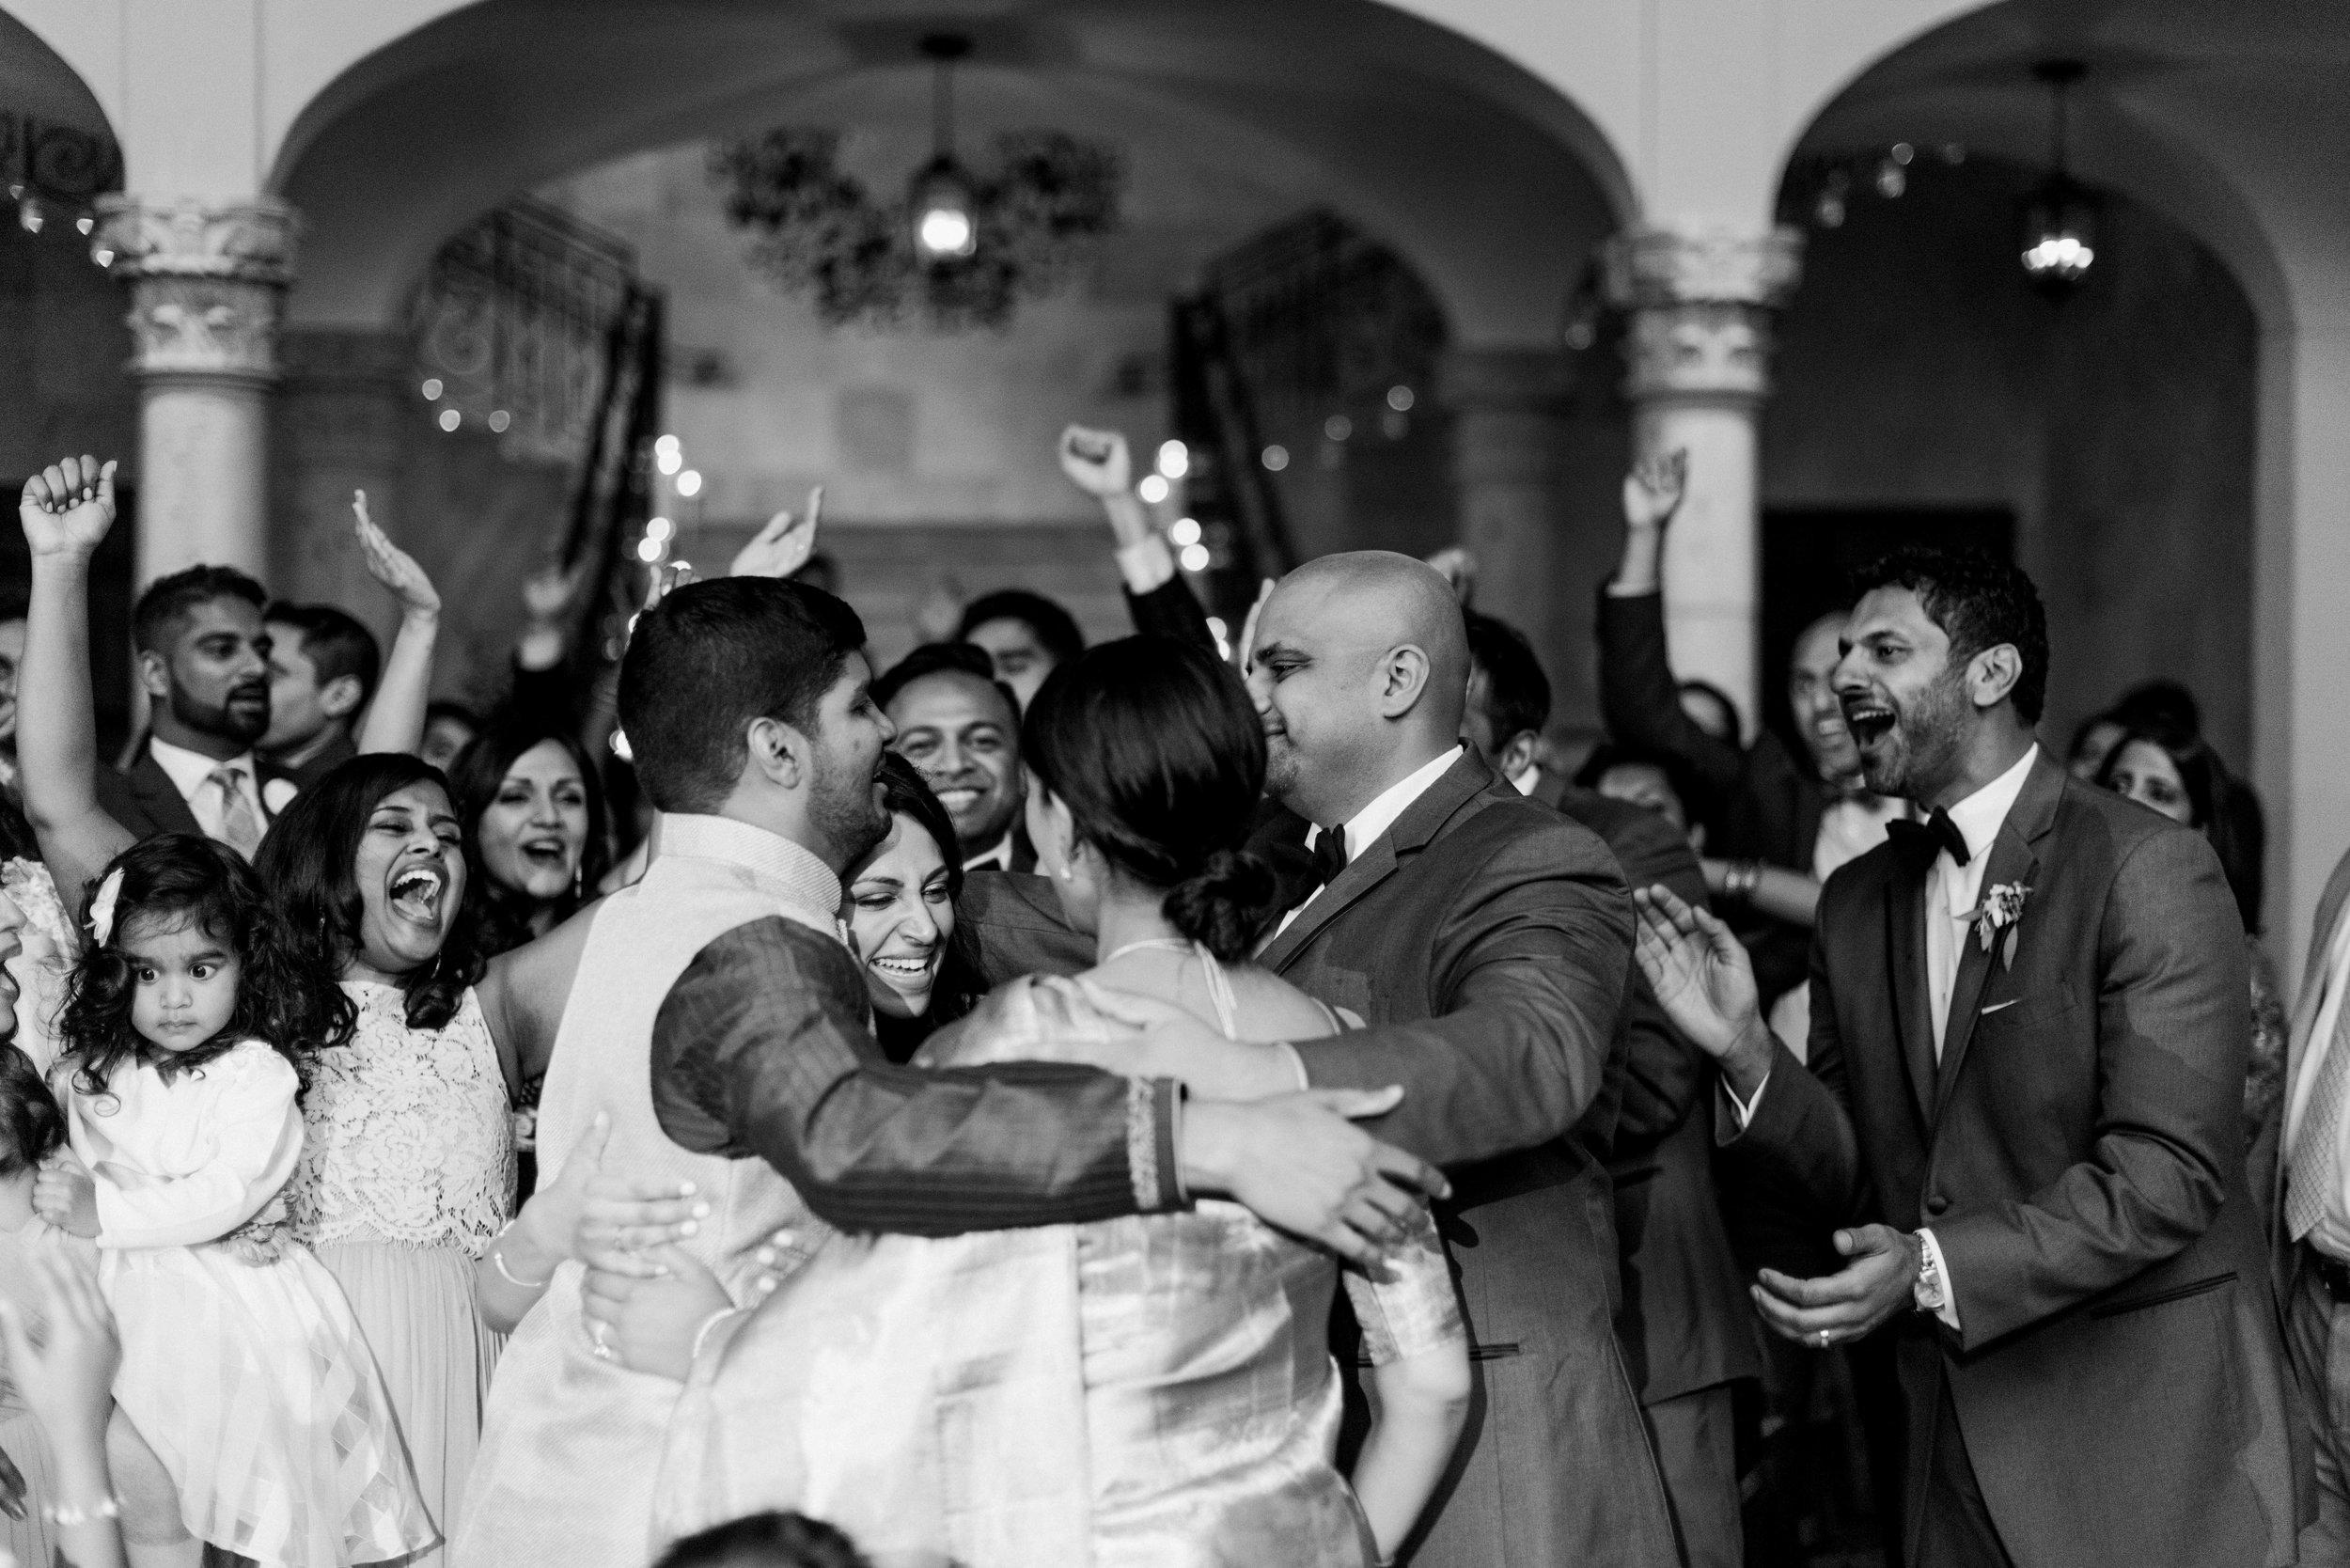 Fine-Art-Film-Houston-Wedding-Photographer-Best-Top-Luxury-Texas-Austin-Dallas-Destination-Dana-Fernandez-Photography-The-Bell-Tower-on-34th-Indian-35.jpg